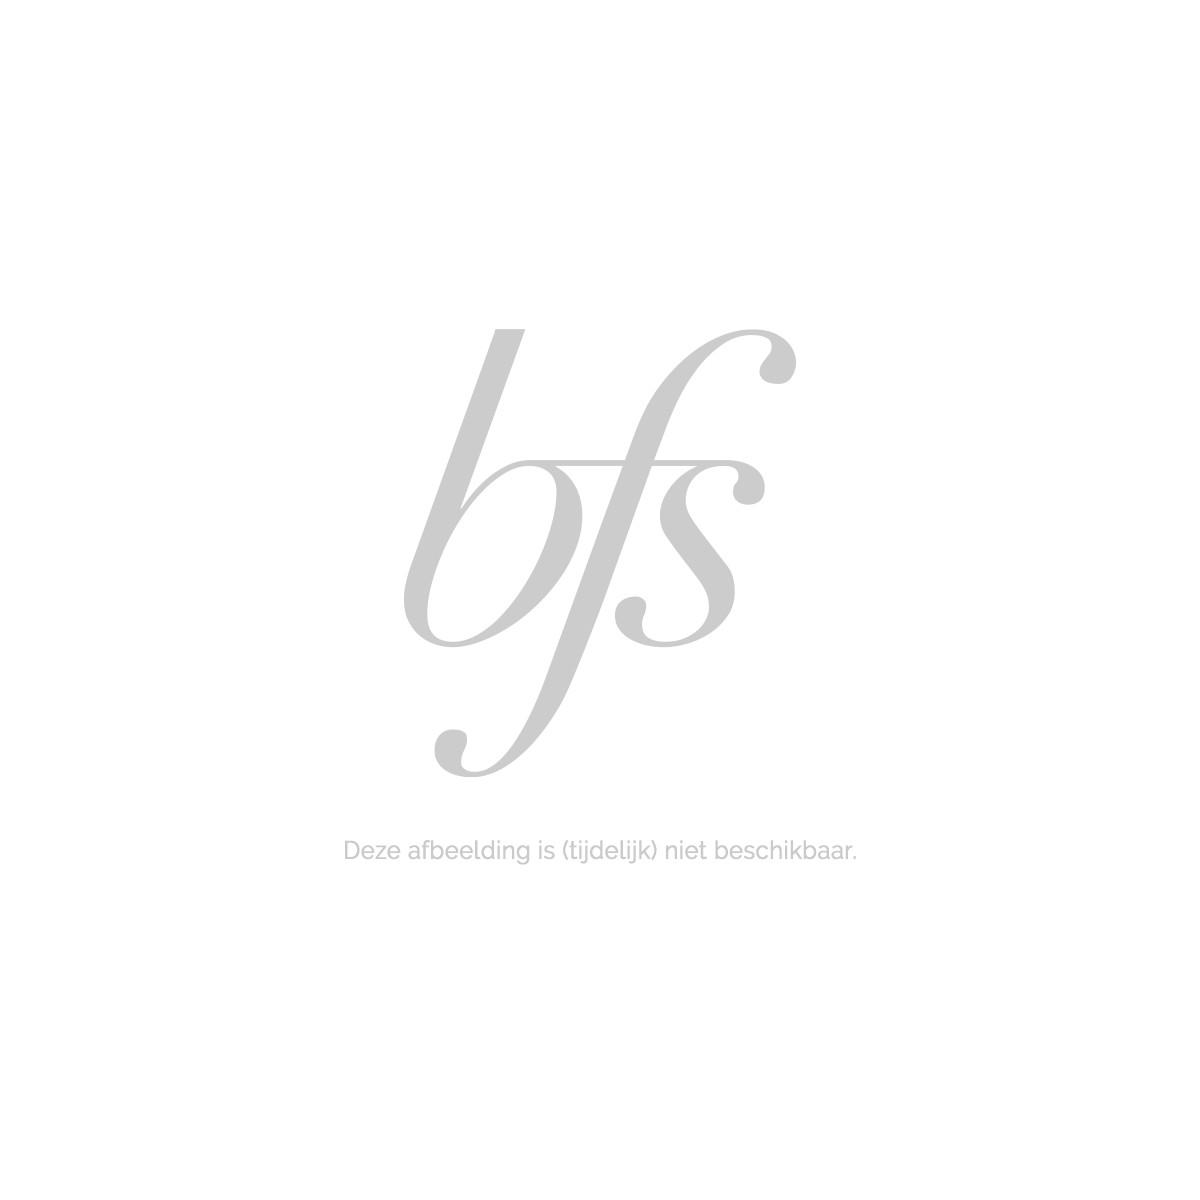 Afbeelding van Anastasia 5 Pieces Kit Taupe Blond Wenkbrauw Make up